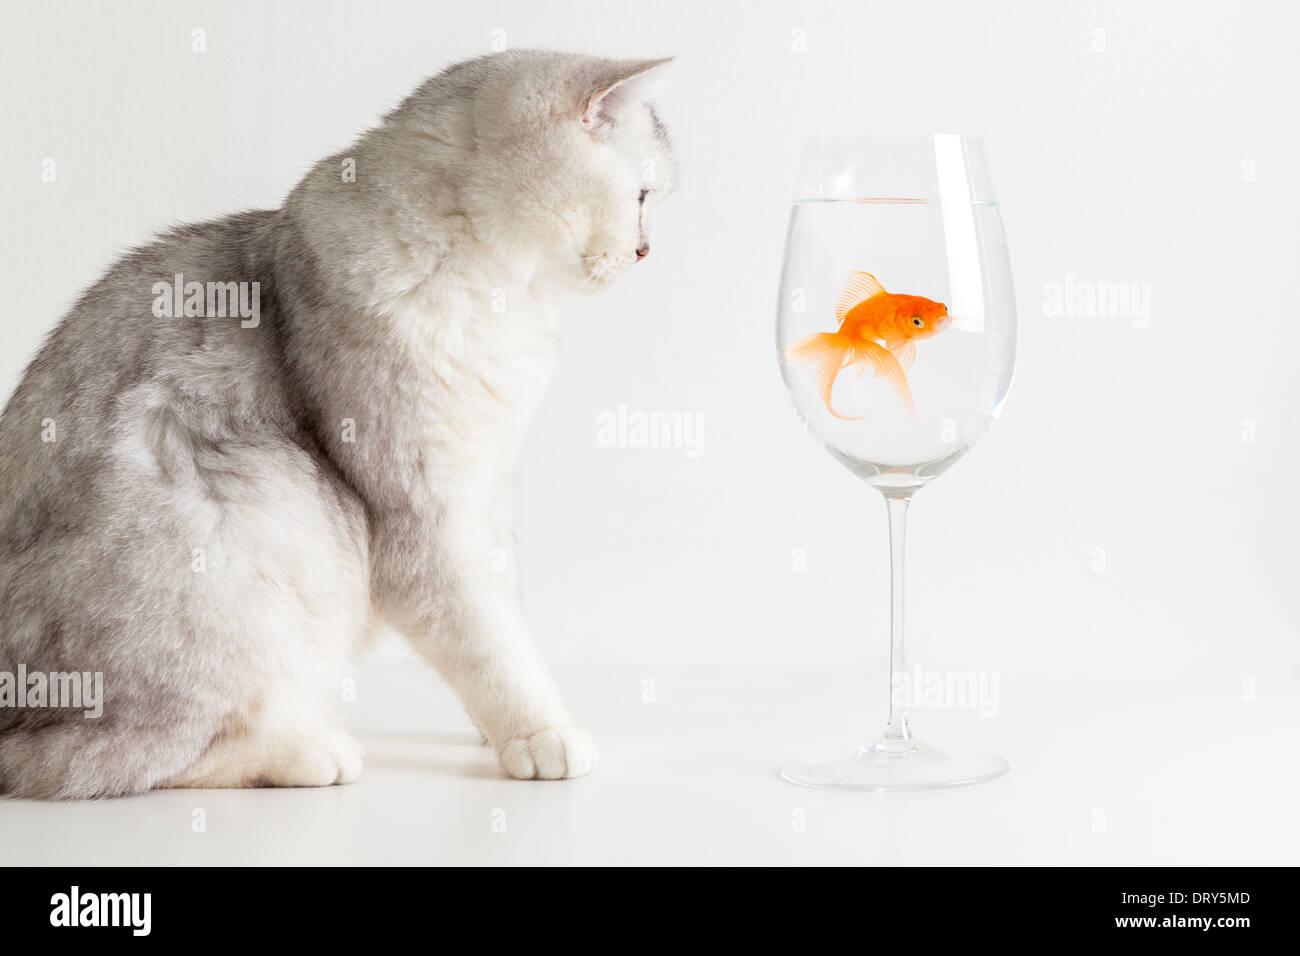 White cat staring at goldfish - Stock Image